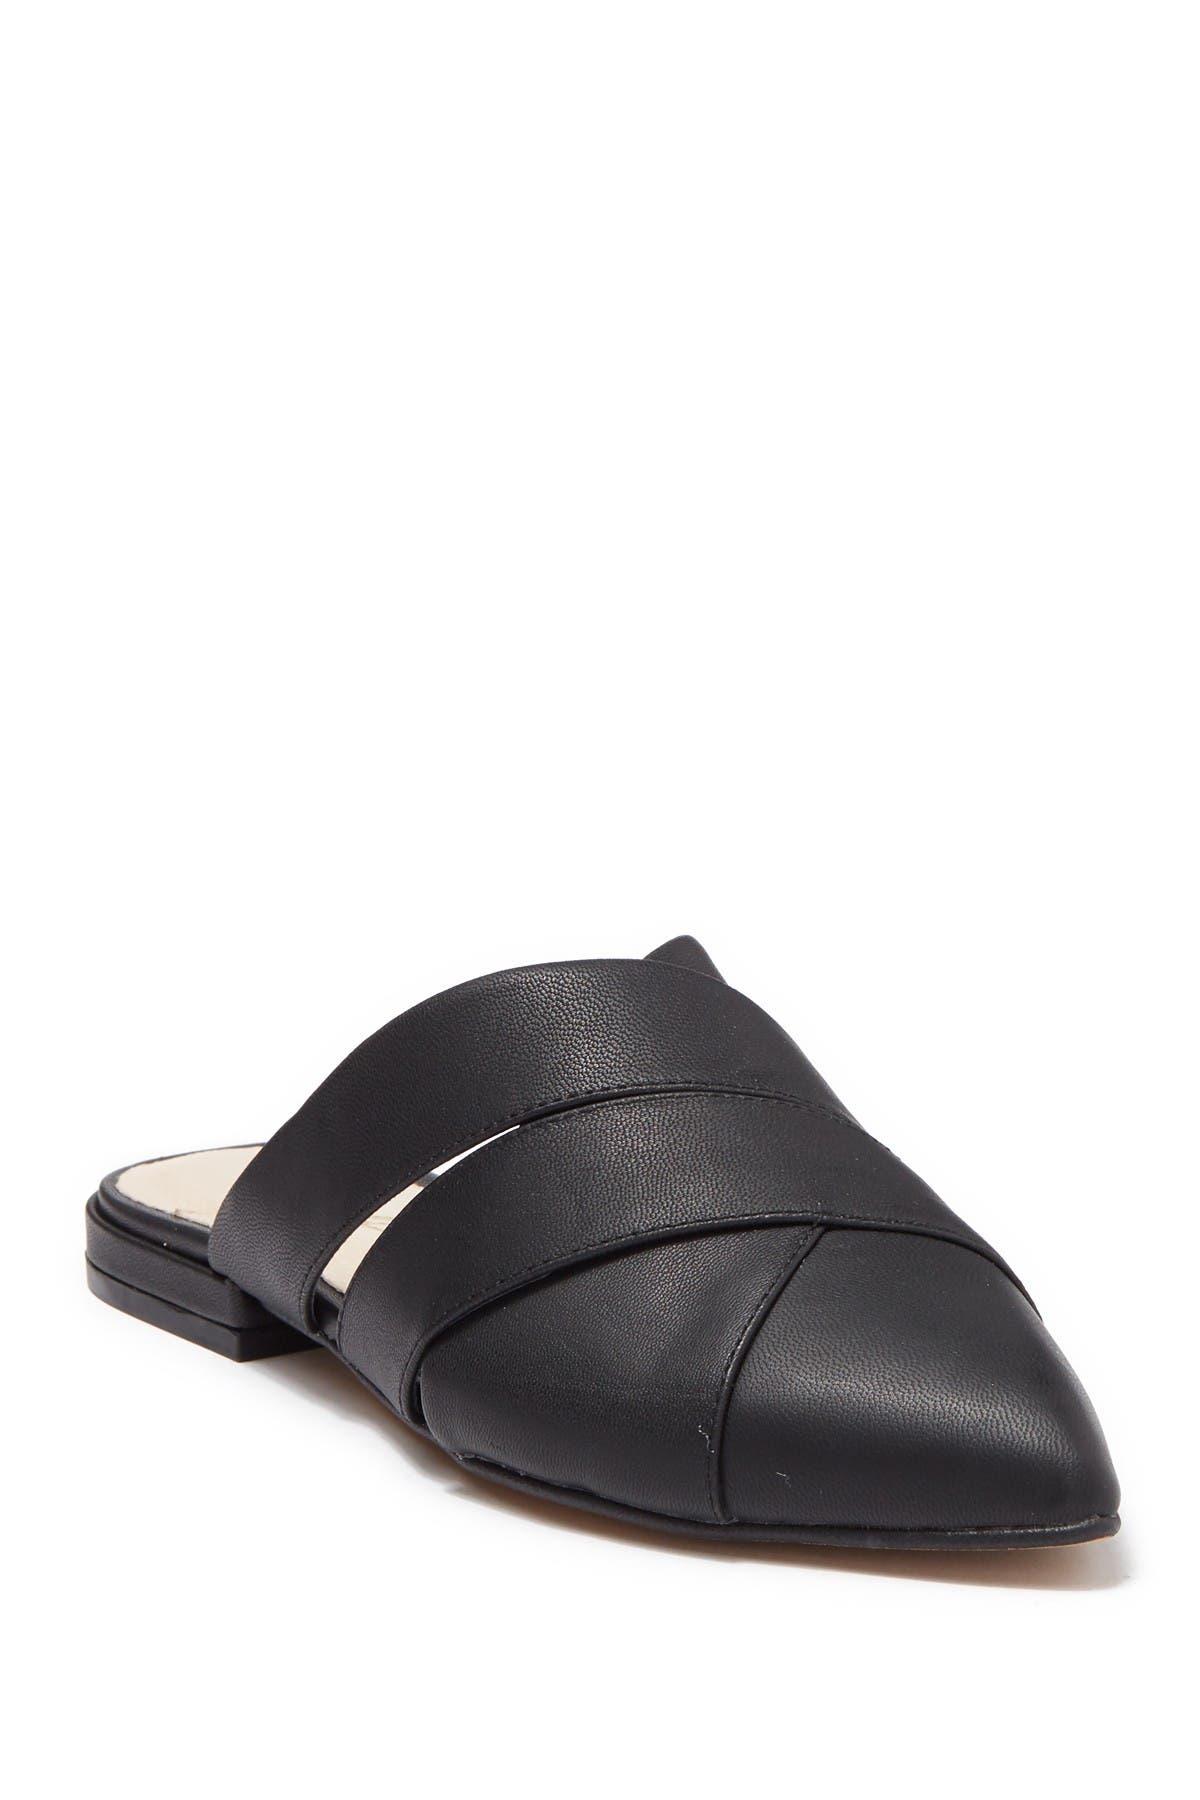 Image of 42 GOLD Carra Leather Slip-On Sandal